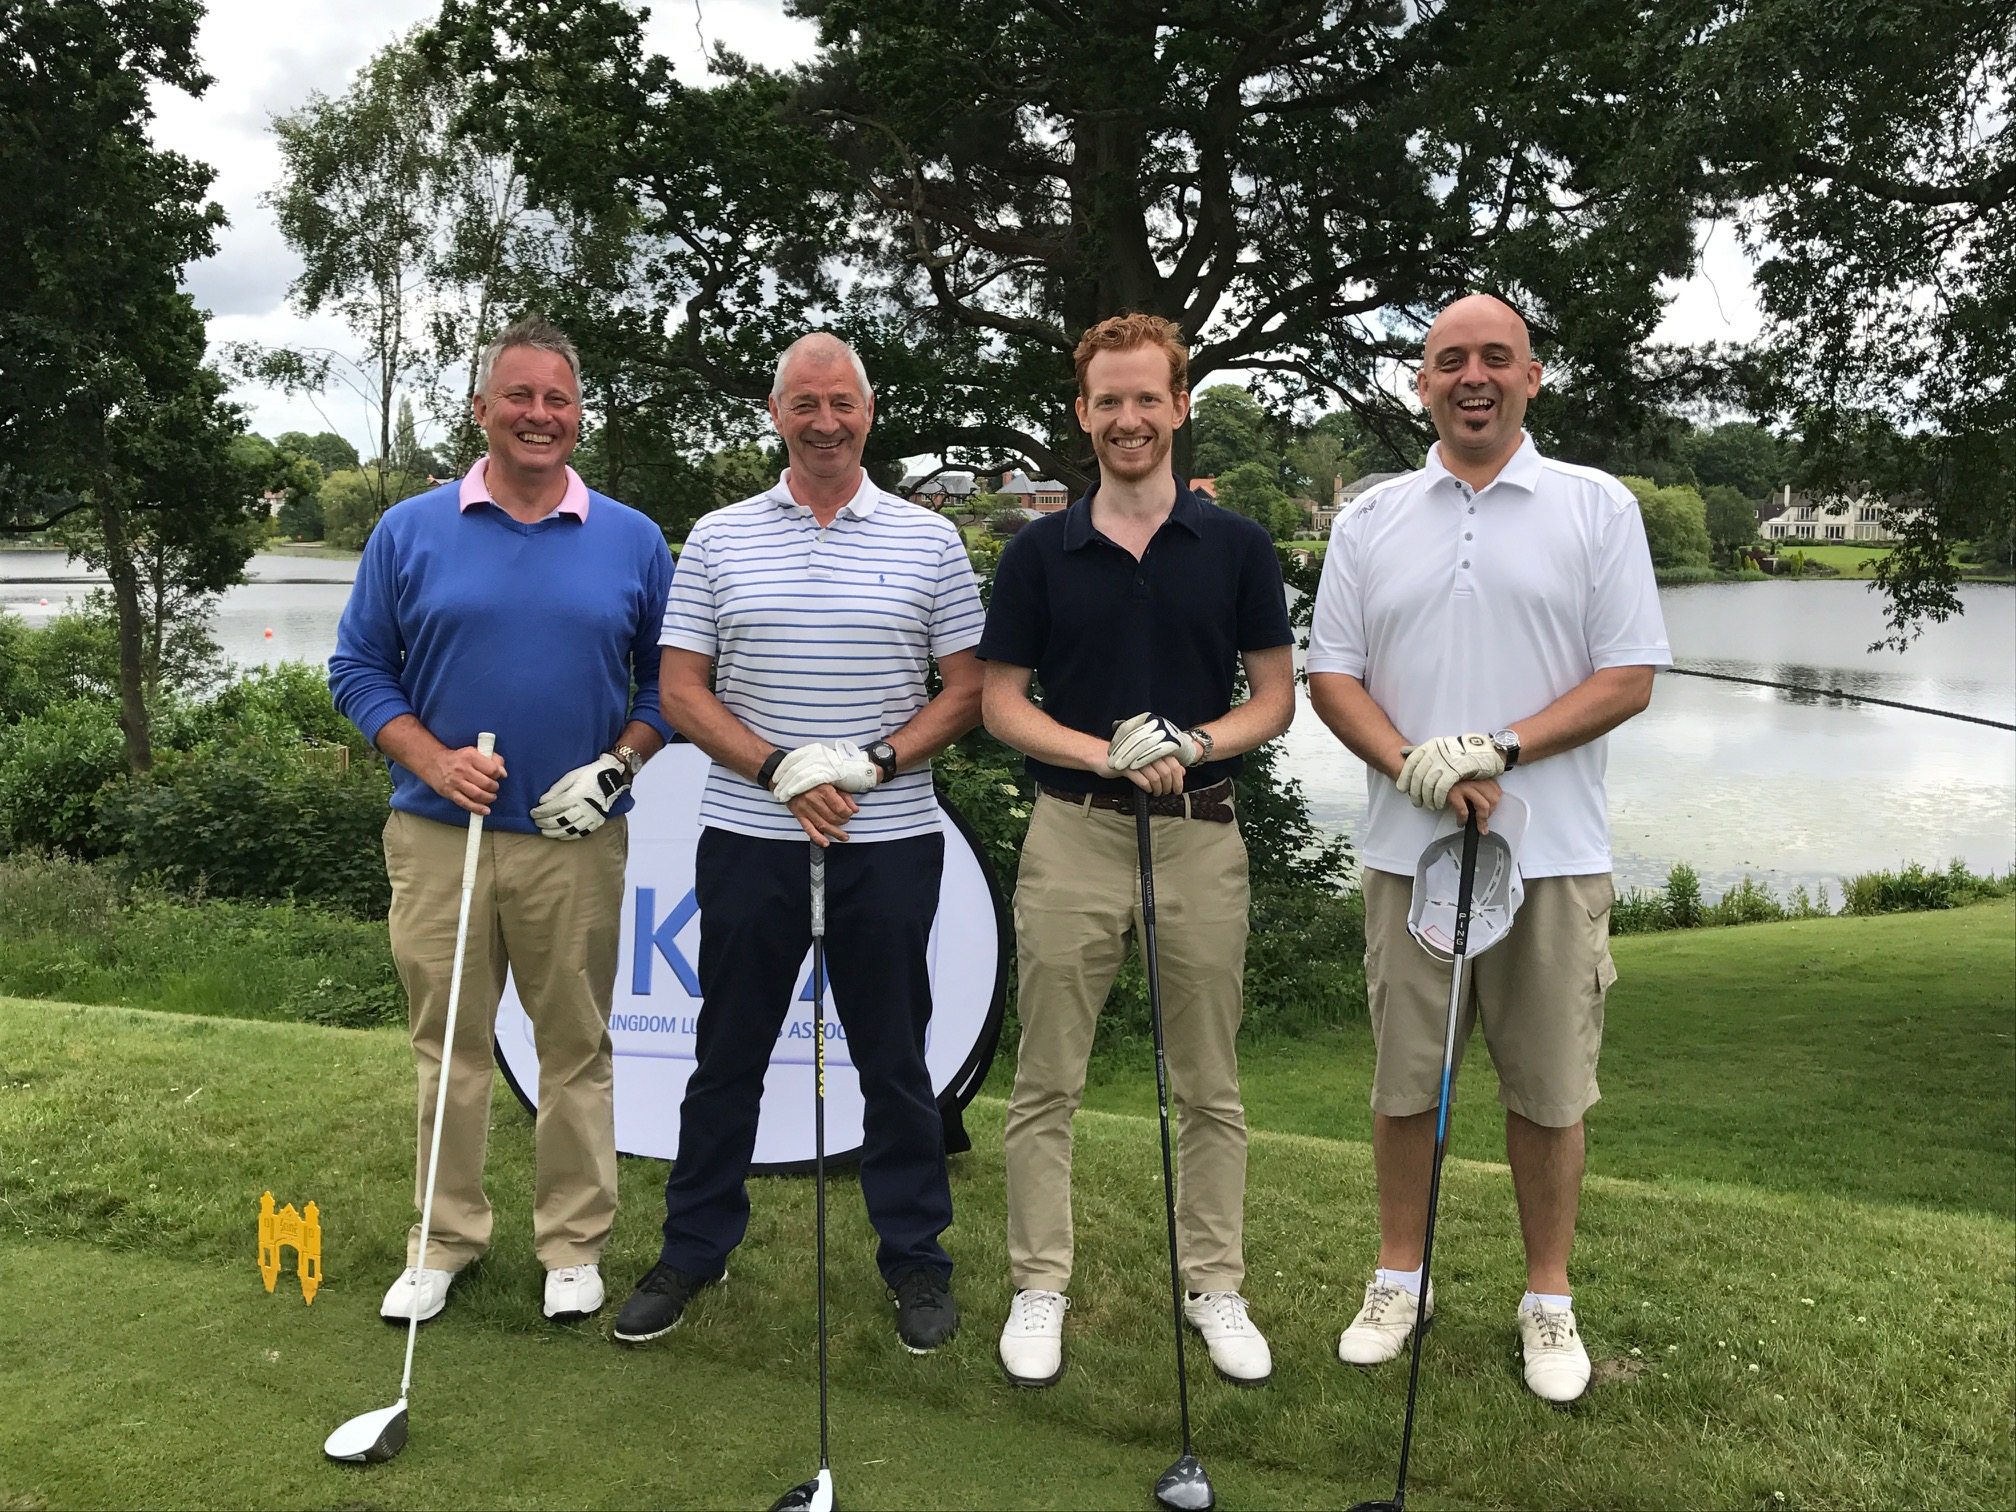 UKLA Golf Day Winning Team